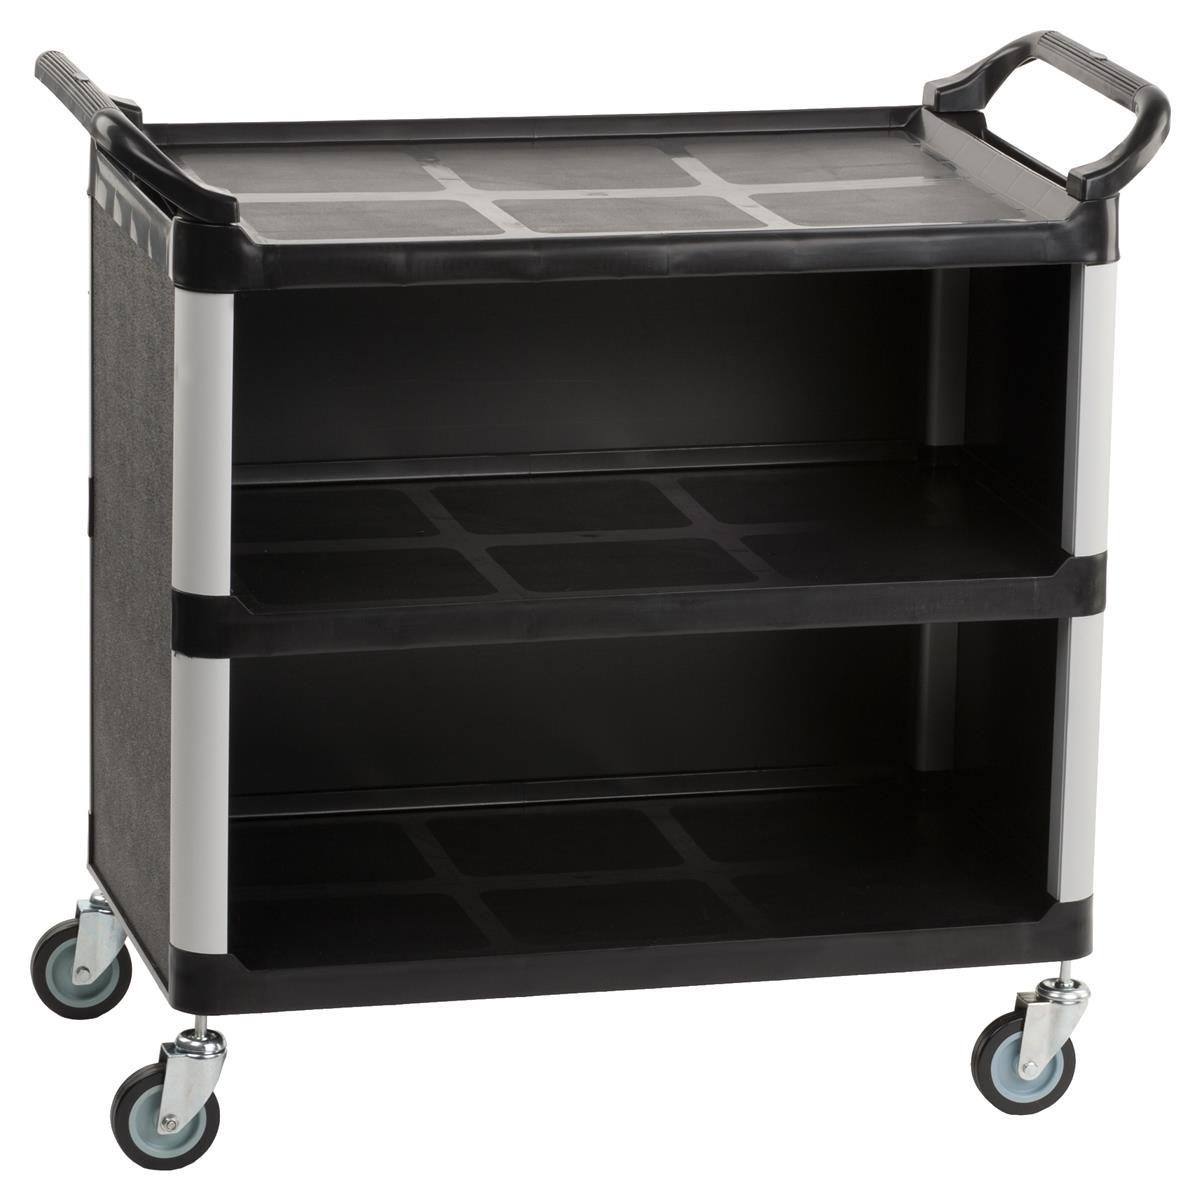 Three Shelf Utility Cart Swivel Casters Amp Enclosed Sides